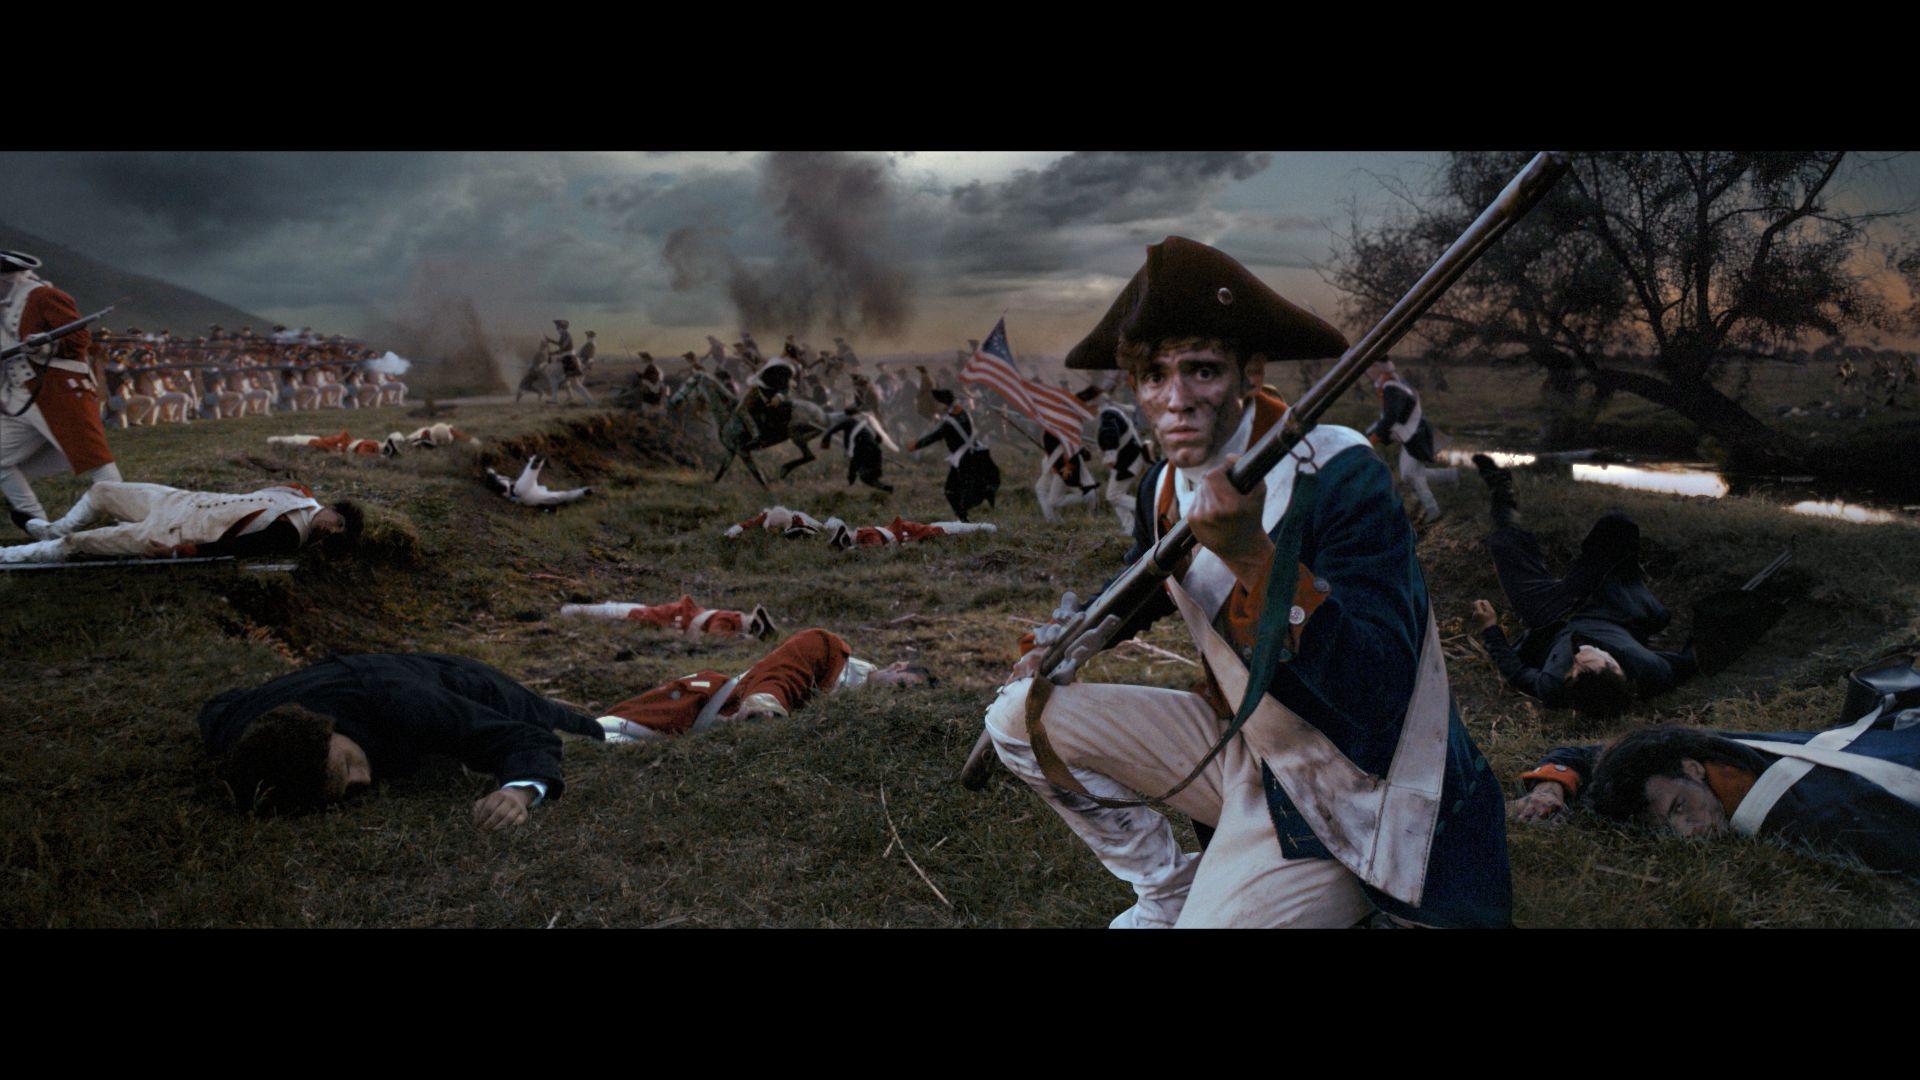 Trailer o boji za svobodu a spravedlnost z Assassin's Creed 3 67468